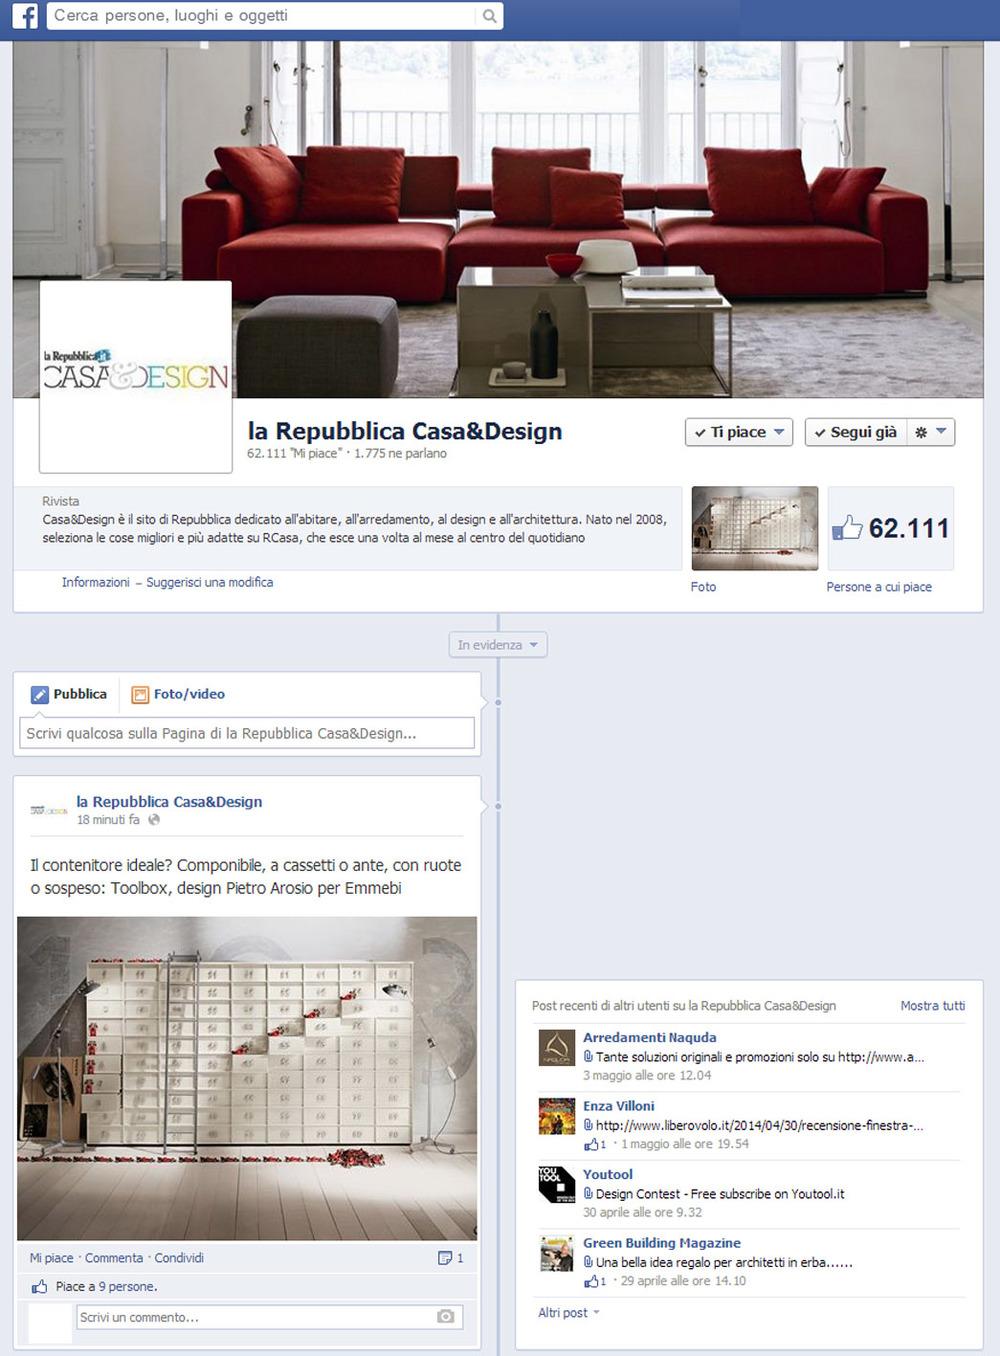 Facebook_La Repubblica Casa&Design 9 Maggio 2014.jpg